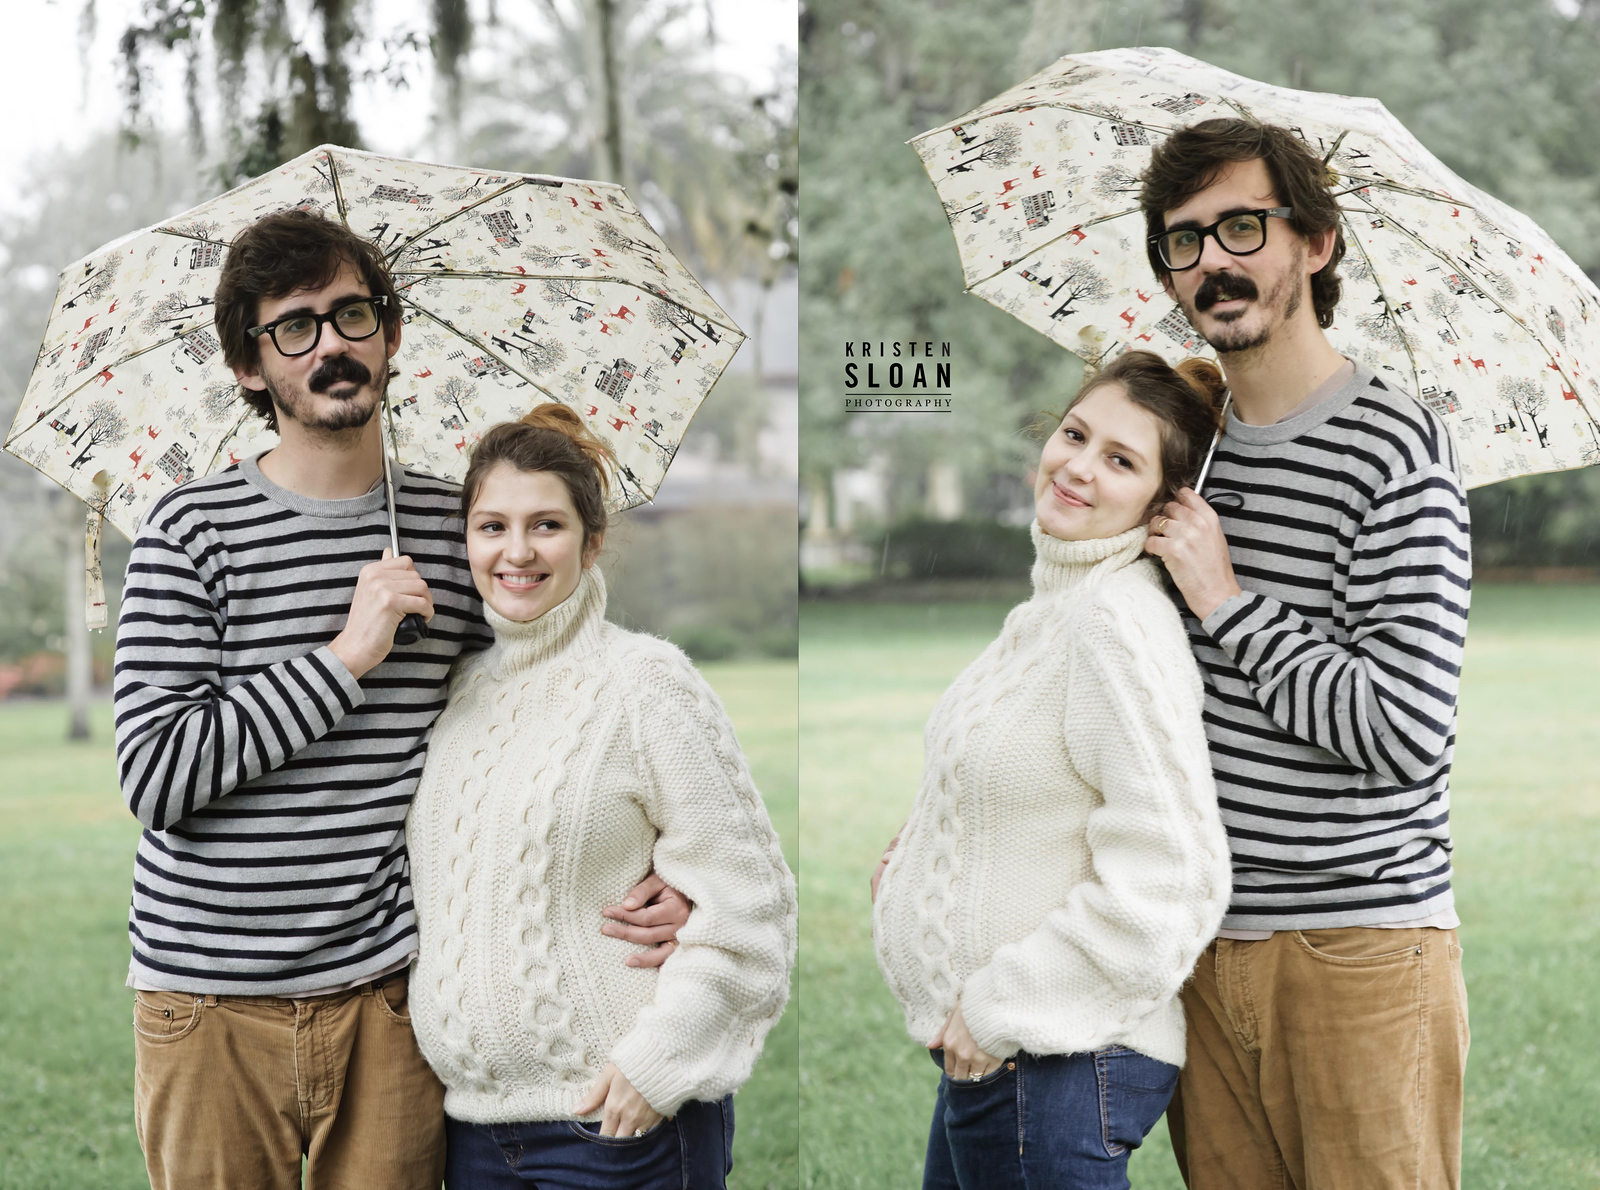 Pregnancy Portraits Tampa Bay Florida Photographer Kristen Sloan